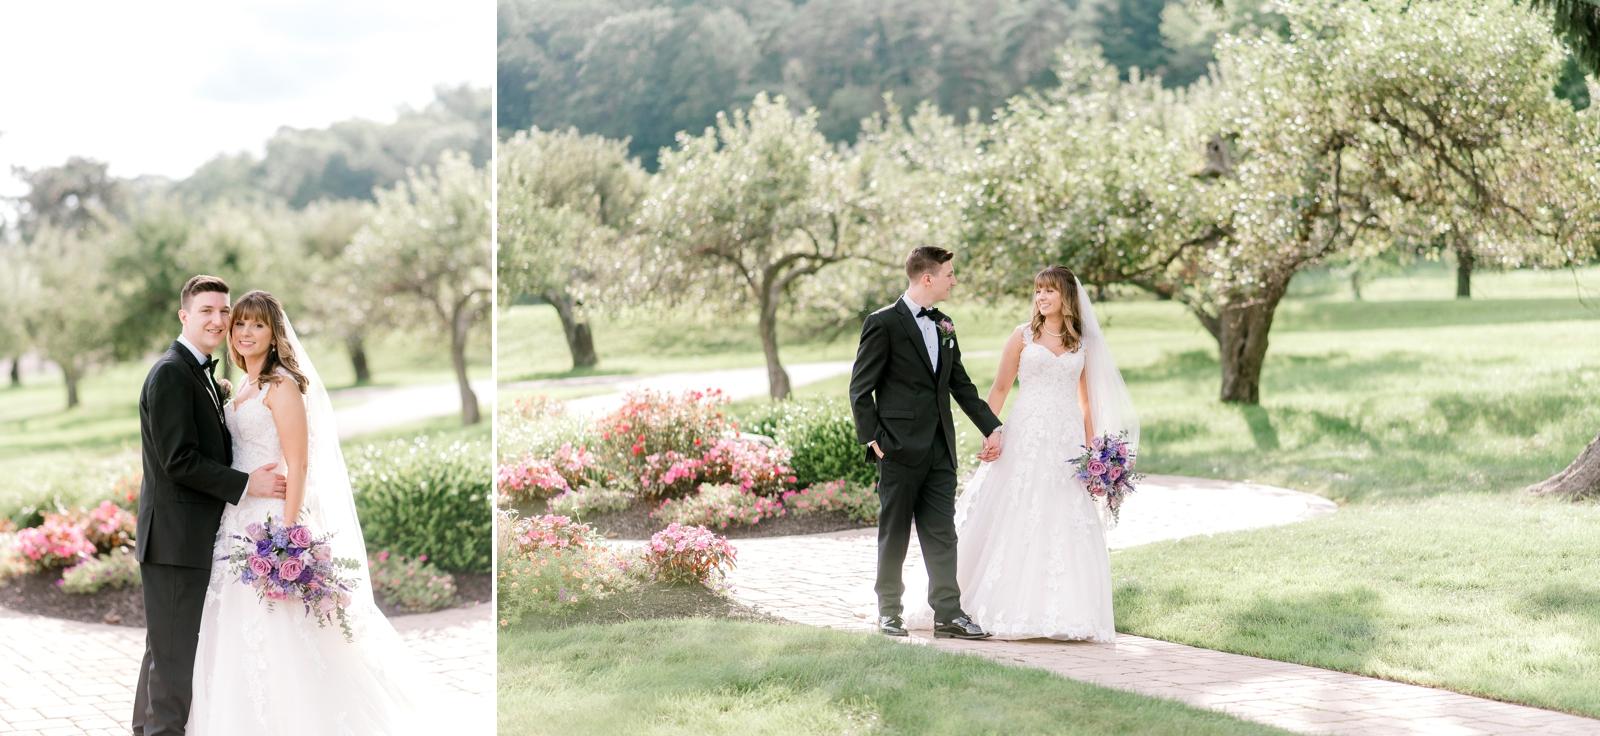 seyerwedding 3.jpg